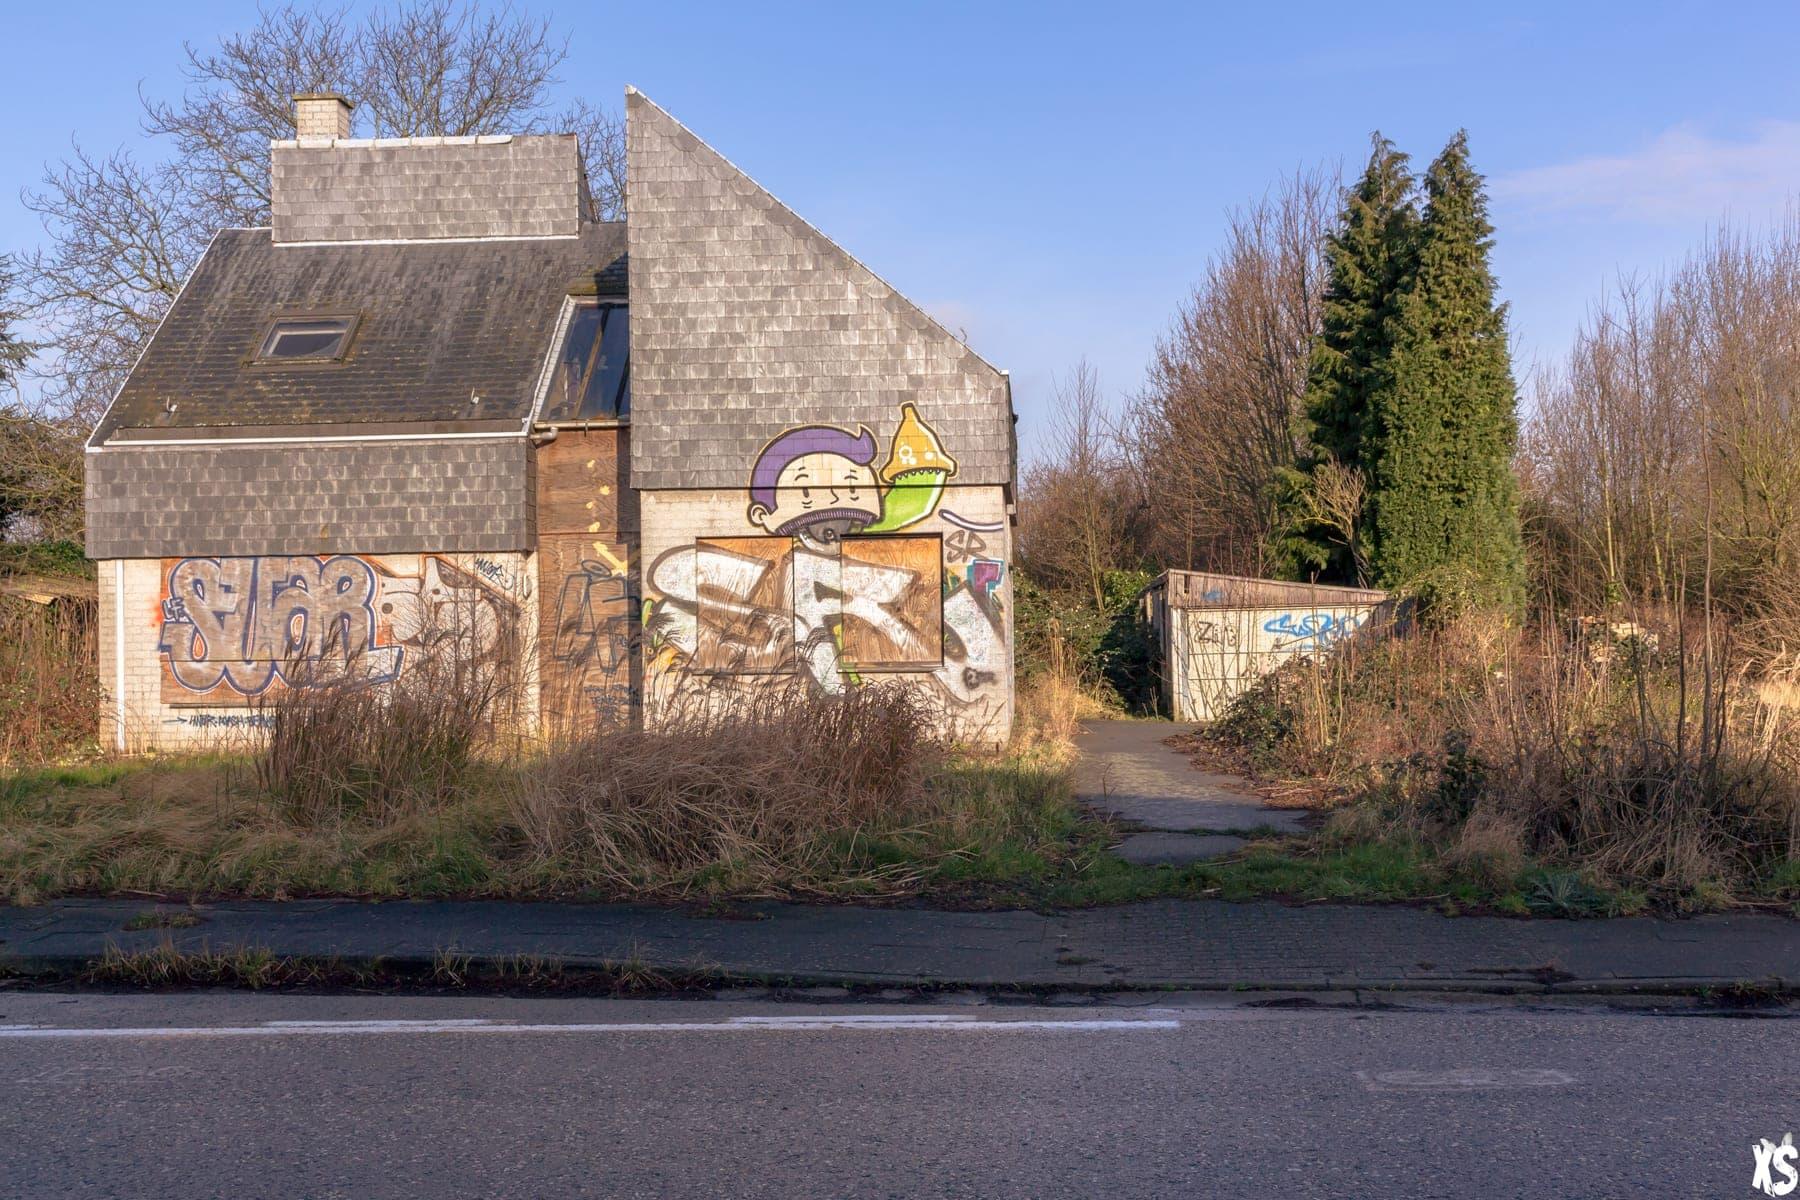 Ciudad abandonada de Doel : https://urbexsession.com/es/ciudad-abandonada-de-doel